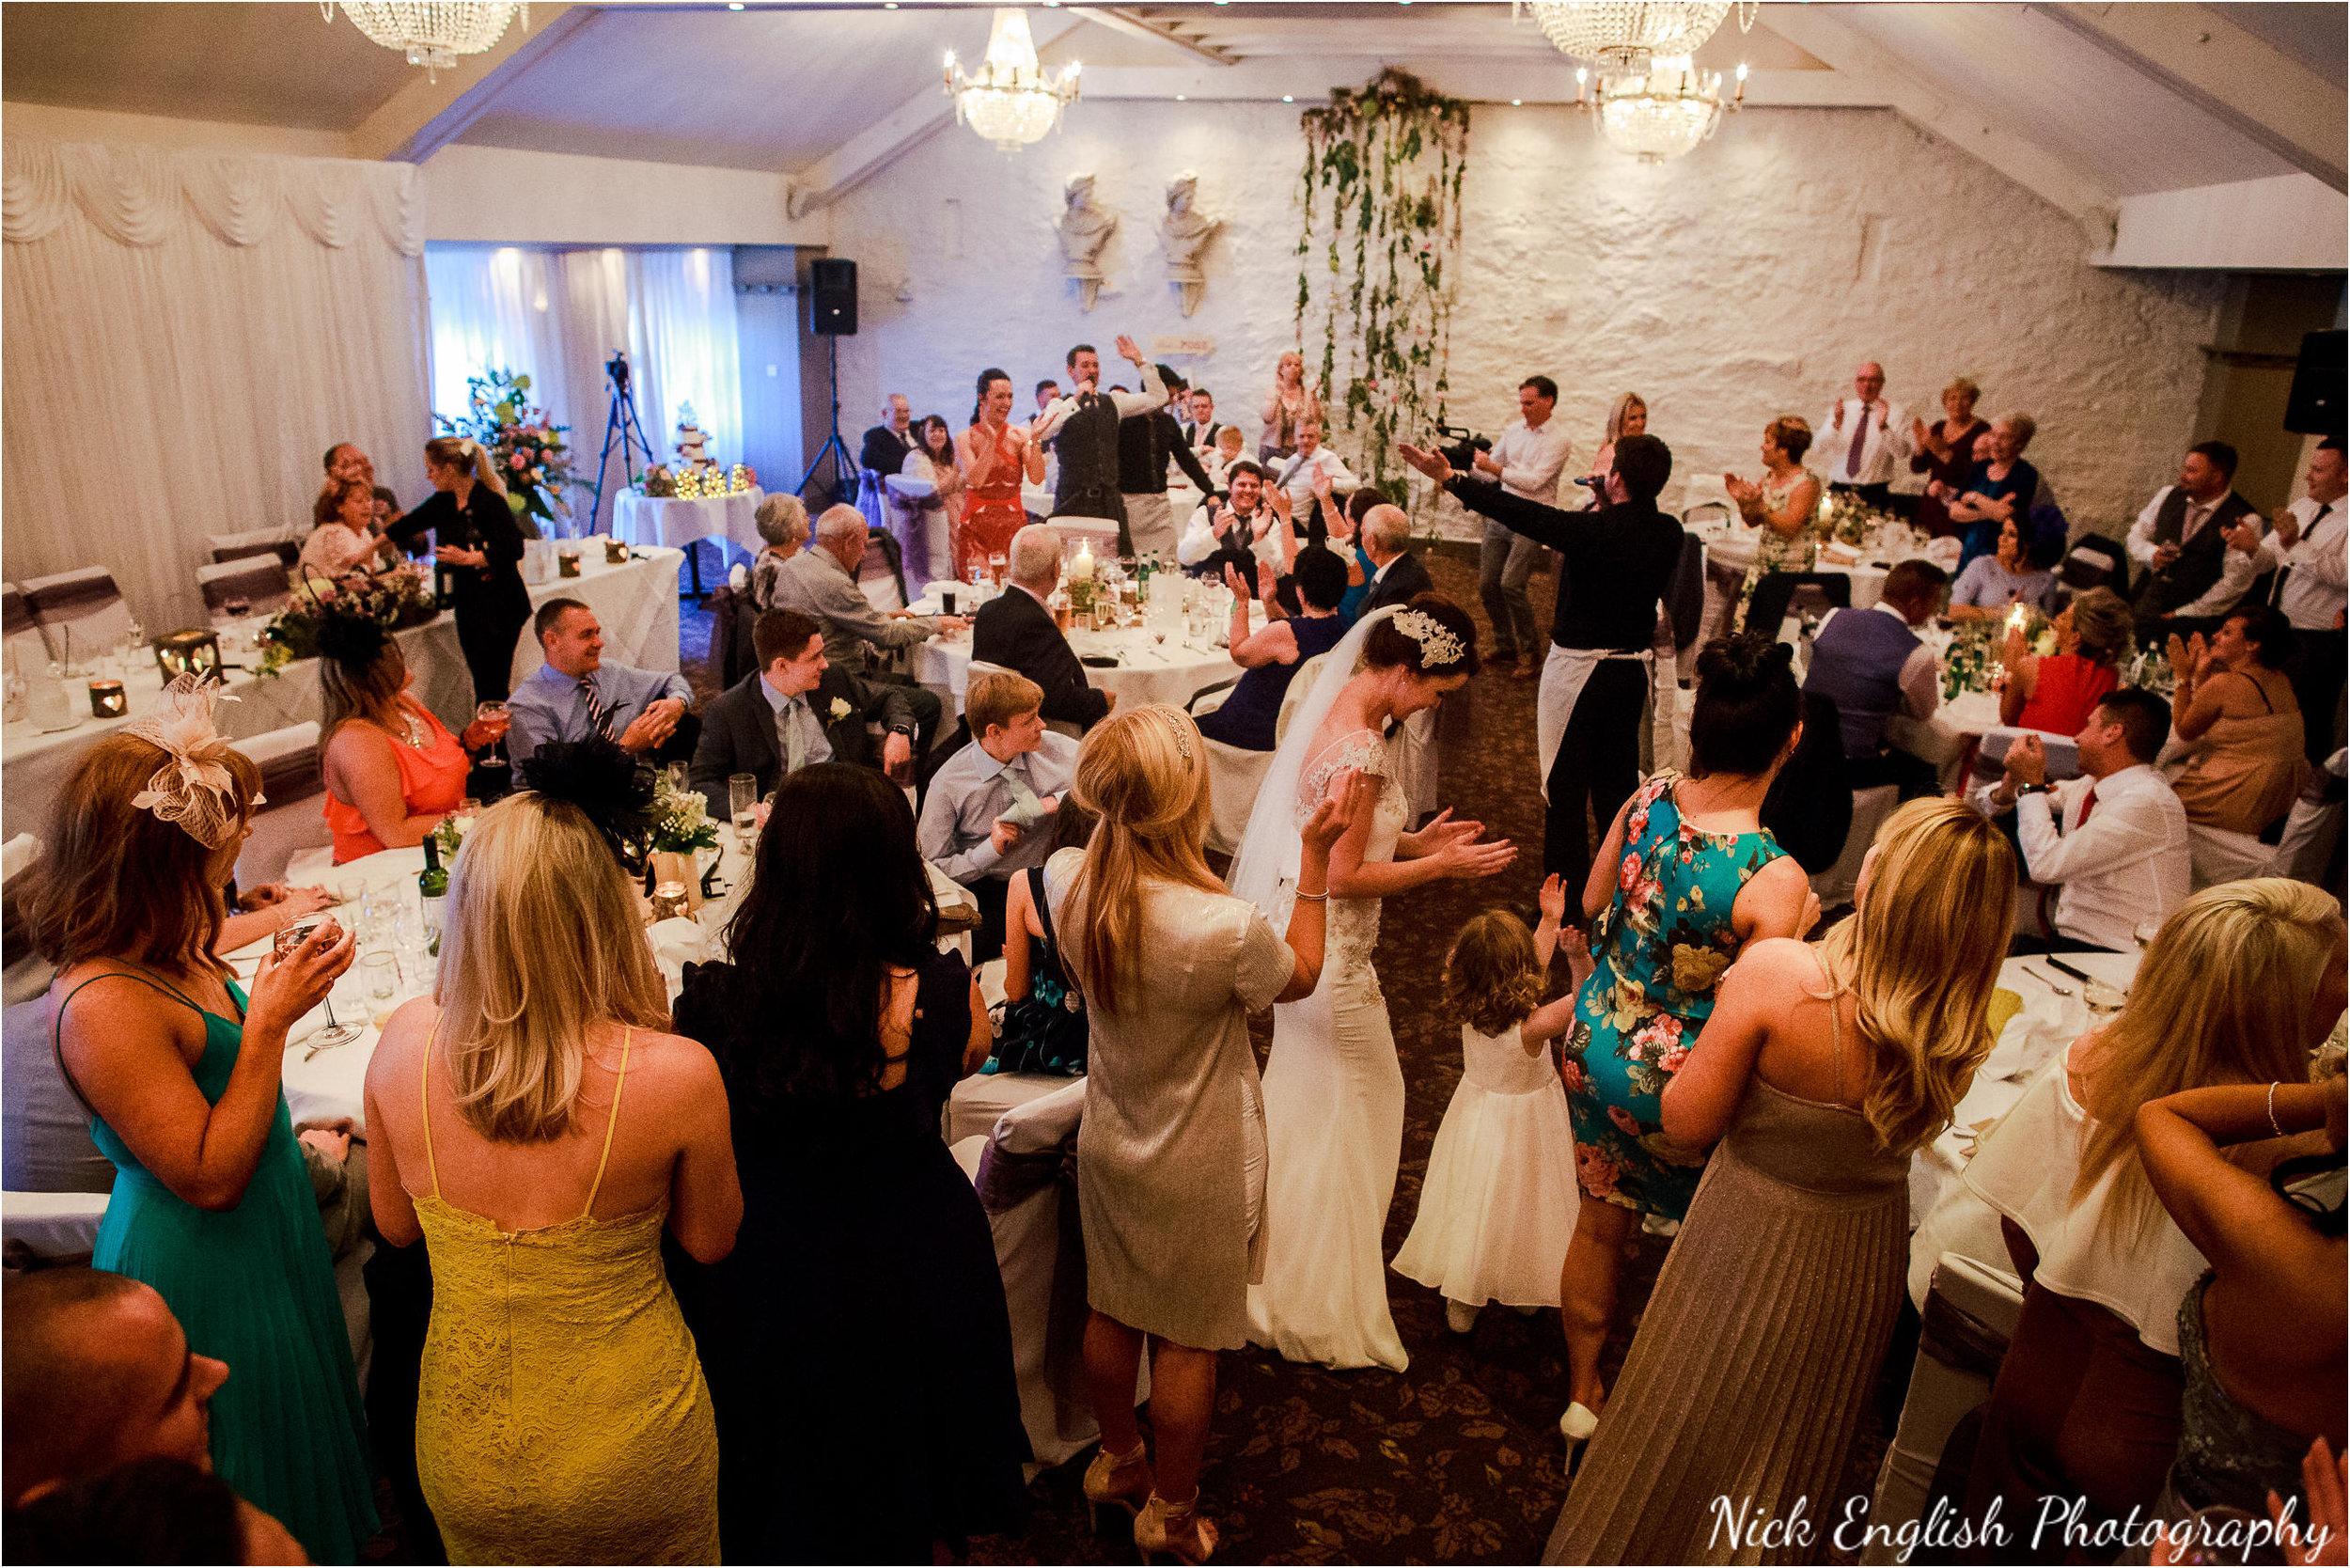 Stacey-Ash-Wedding-Photographs-Stanley-House-Preston-Lancashire-197.jpg